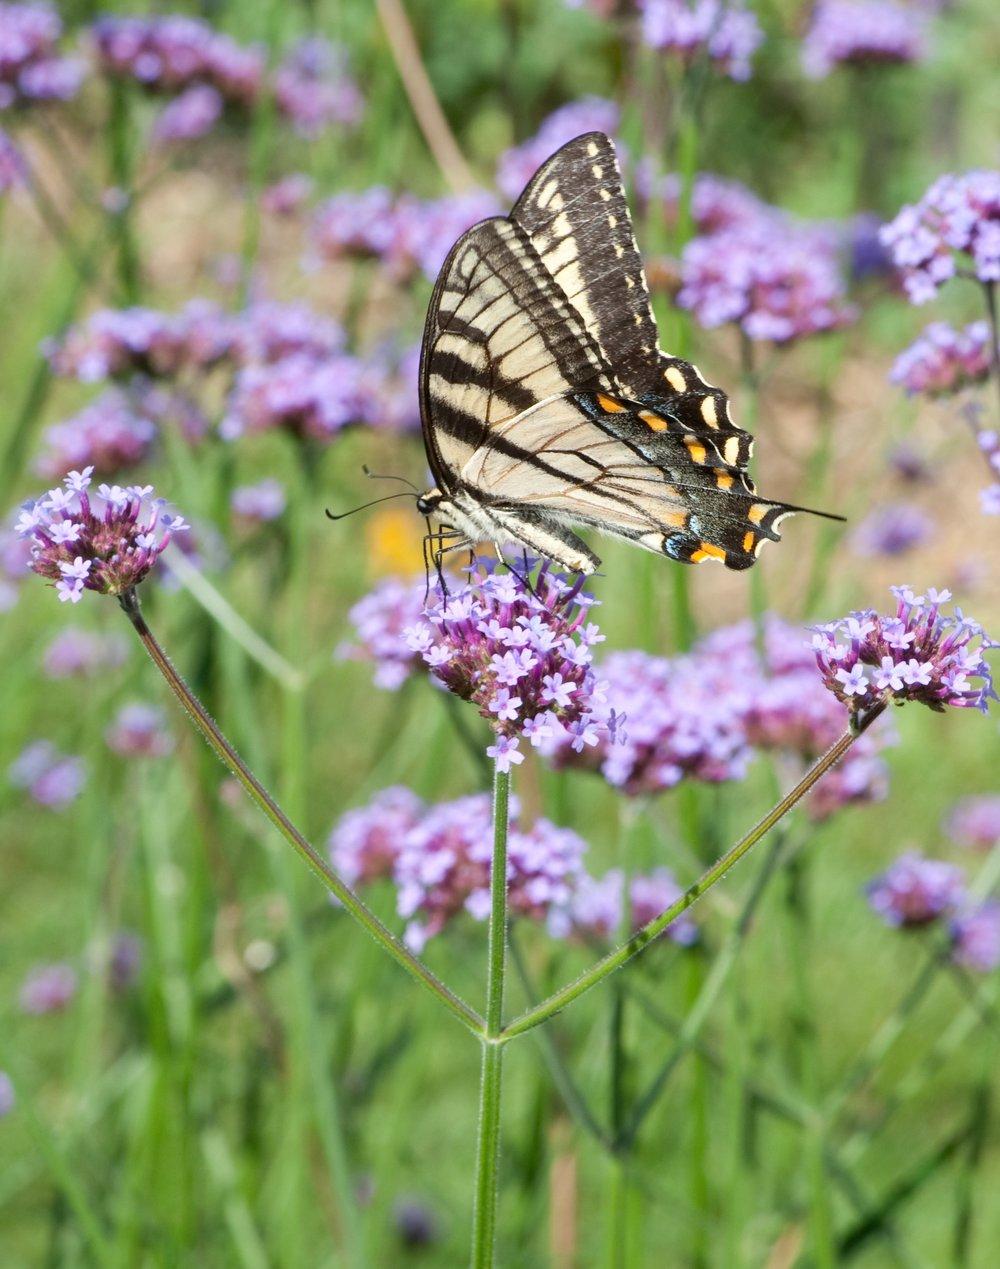 Anise swallowtail butterfly on  Verbena bonariensis  flowers.